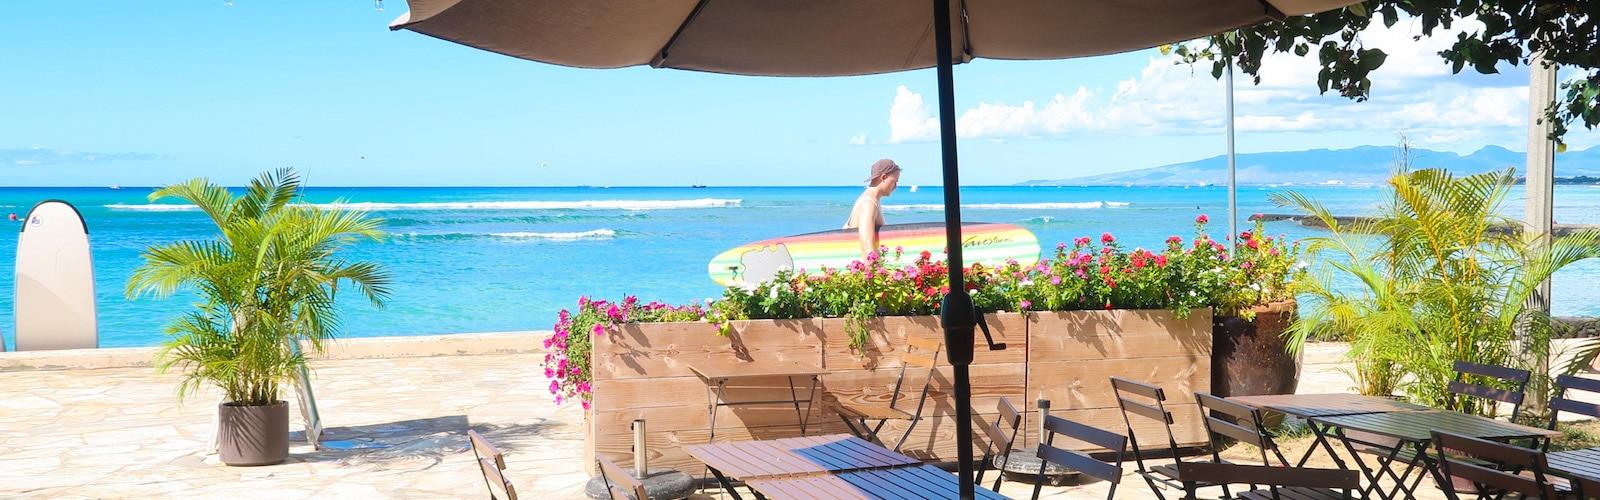 Barefoot Beach Cafe, Outdoor Dining Options in Waikiki, Honolulu